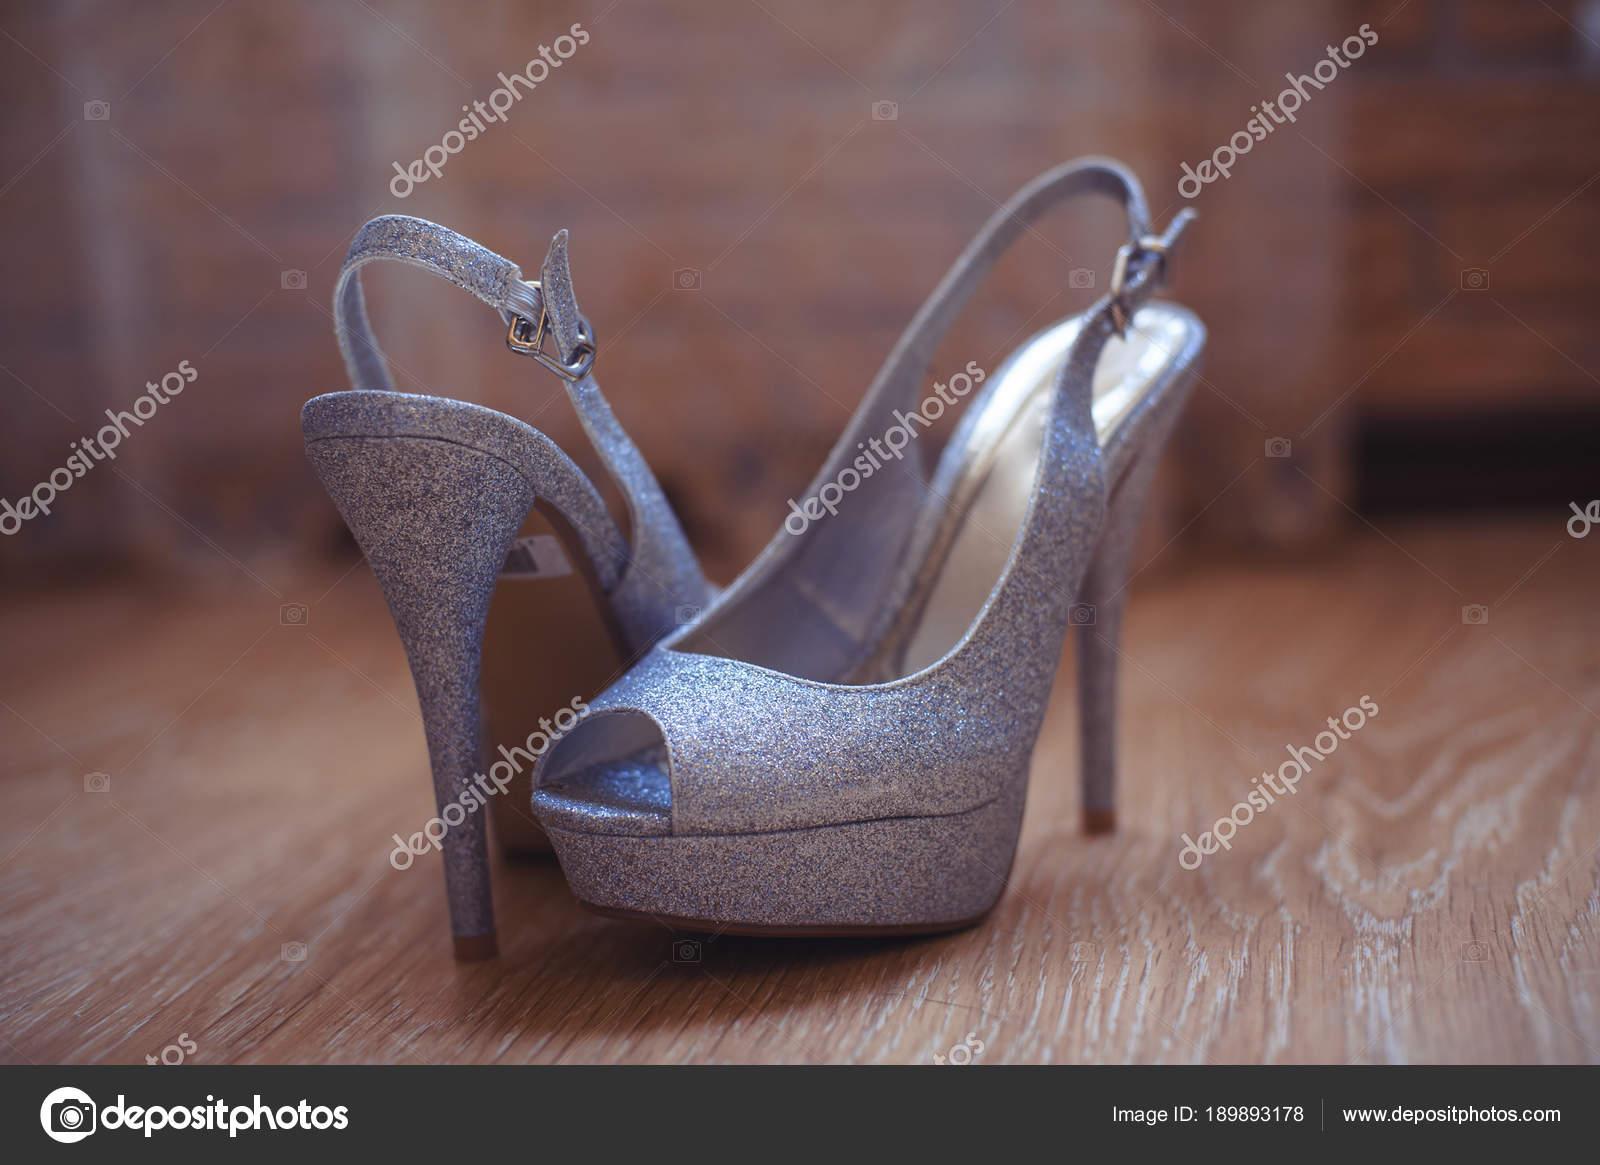 e4377ebf8f1 Γυναικεία παπούτσια ξαπλωμένο στο πάτωμα σε μια ημι-σκούρο φόντο– εικόνα  αρχείου